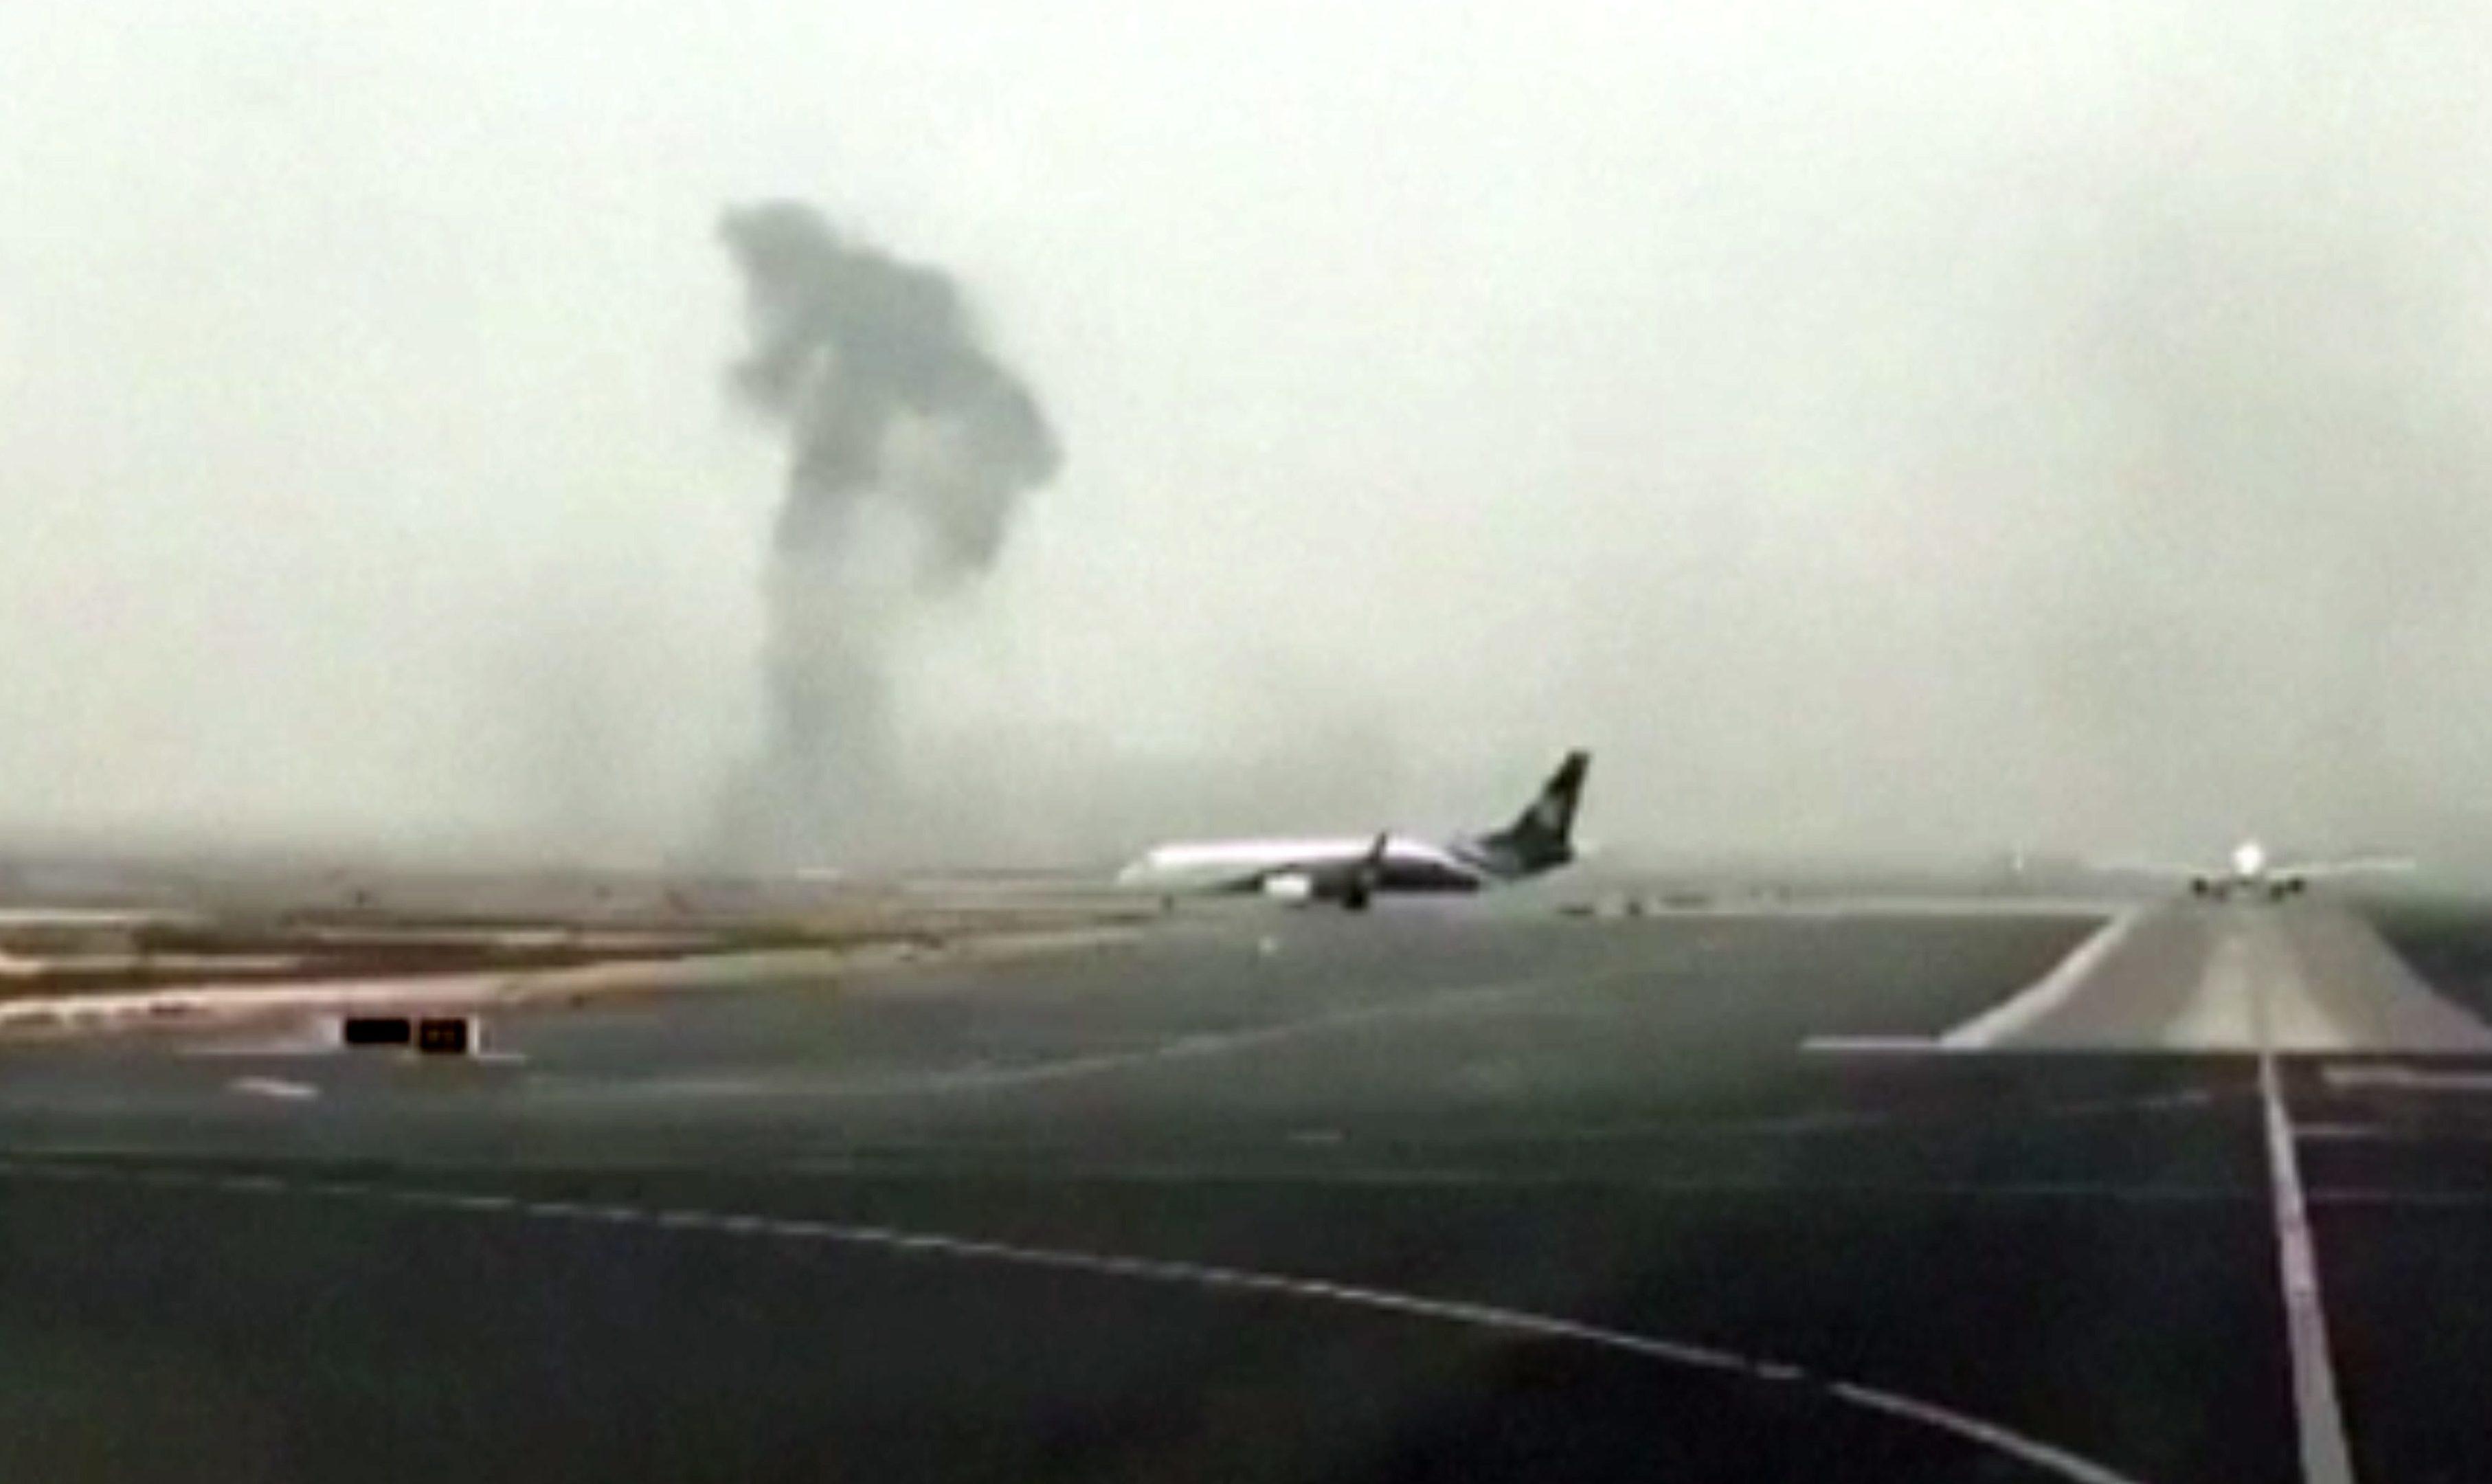 Smoke rising after an Emirates flight crash landed at Dubai International Airport.